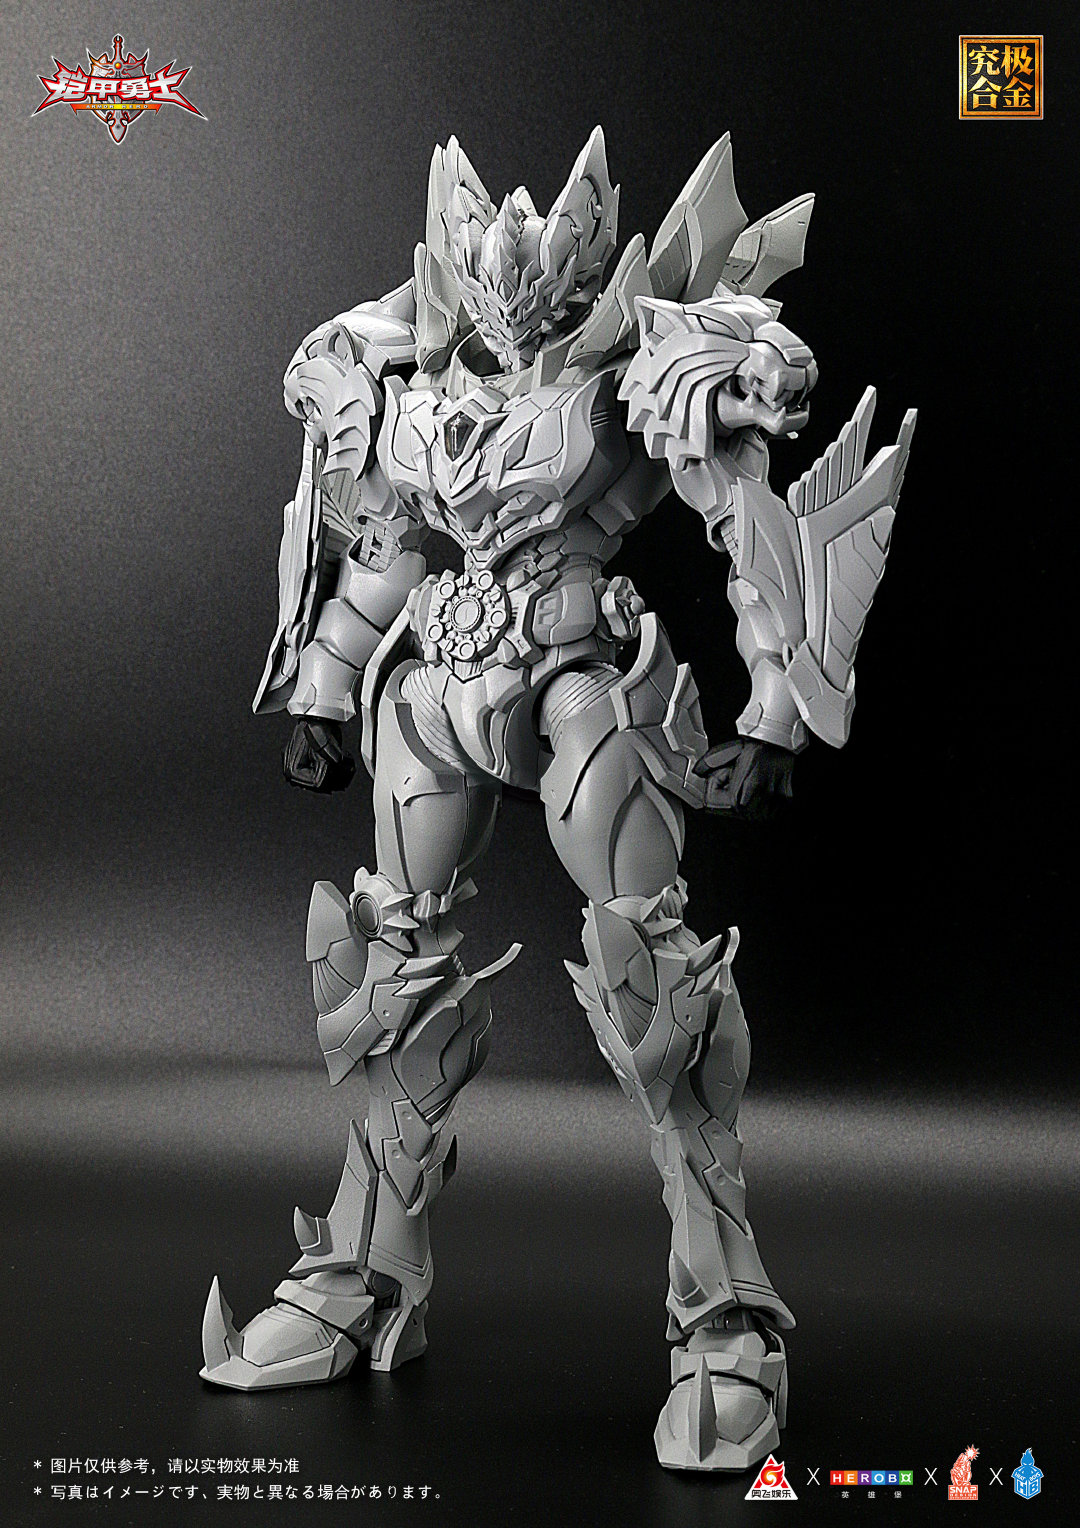 S535_Armor_hero_Emperor_012.jpg